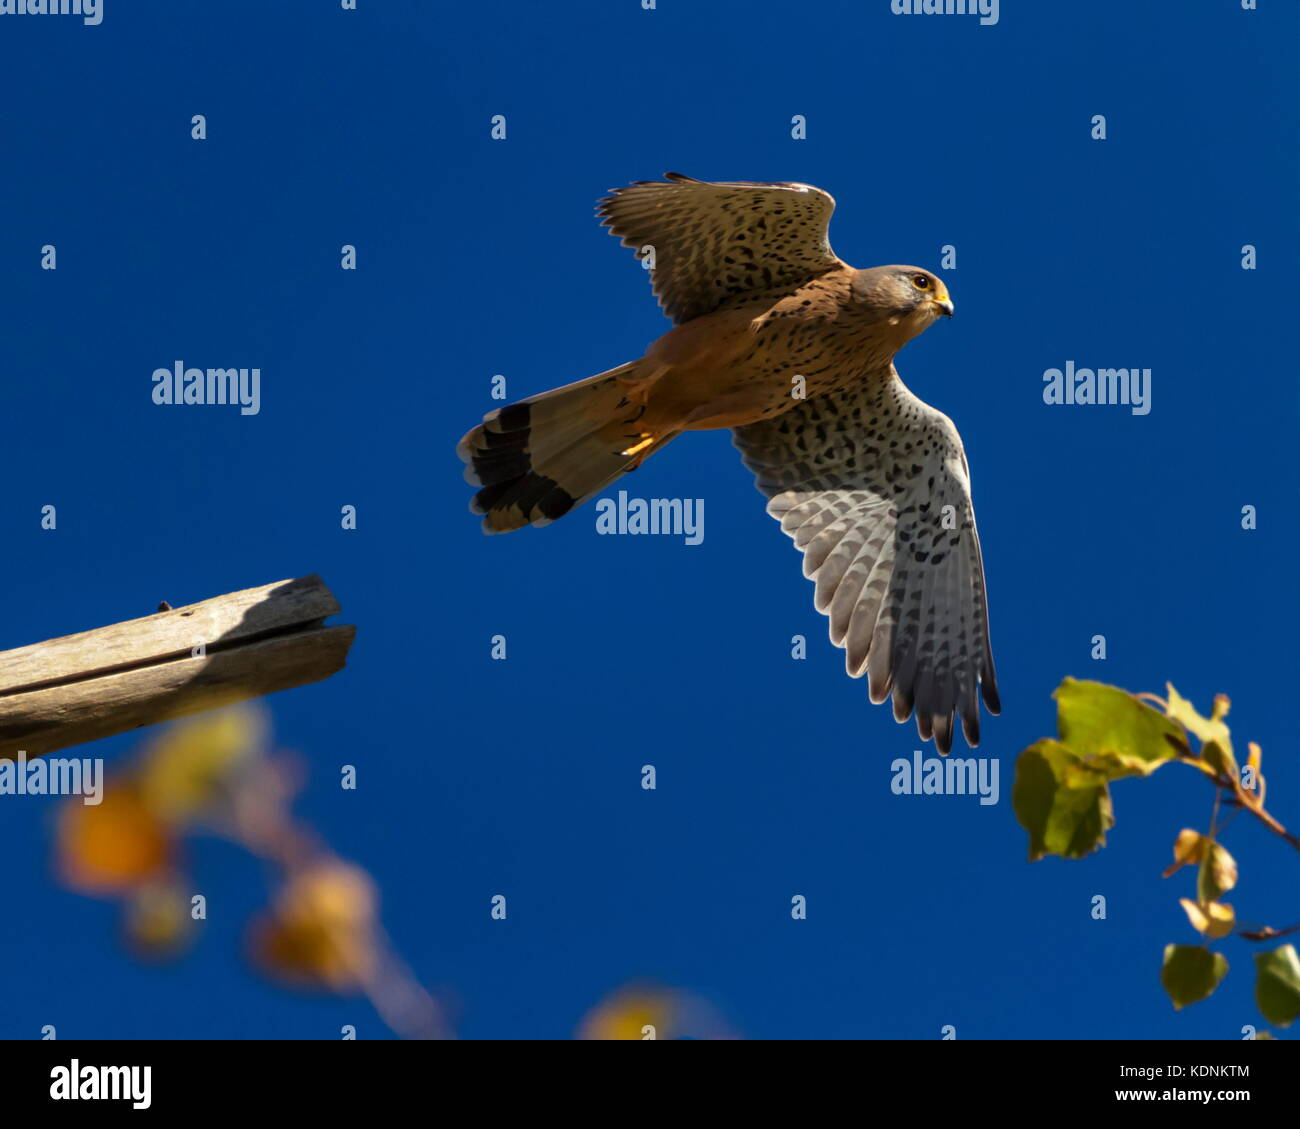 European, eurasian, common or old world kestrel, falco tinnunculus flying up - Stock Image